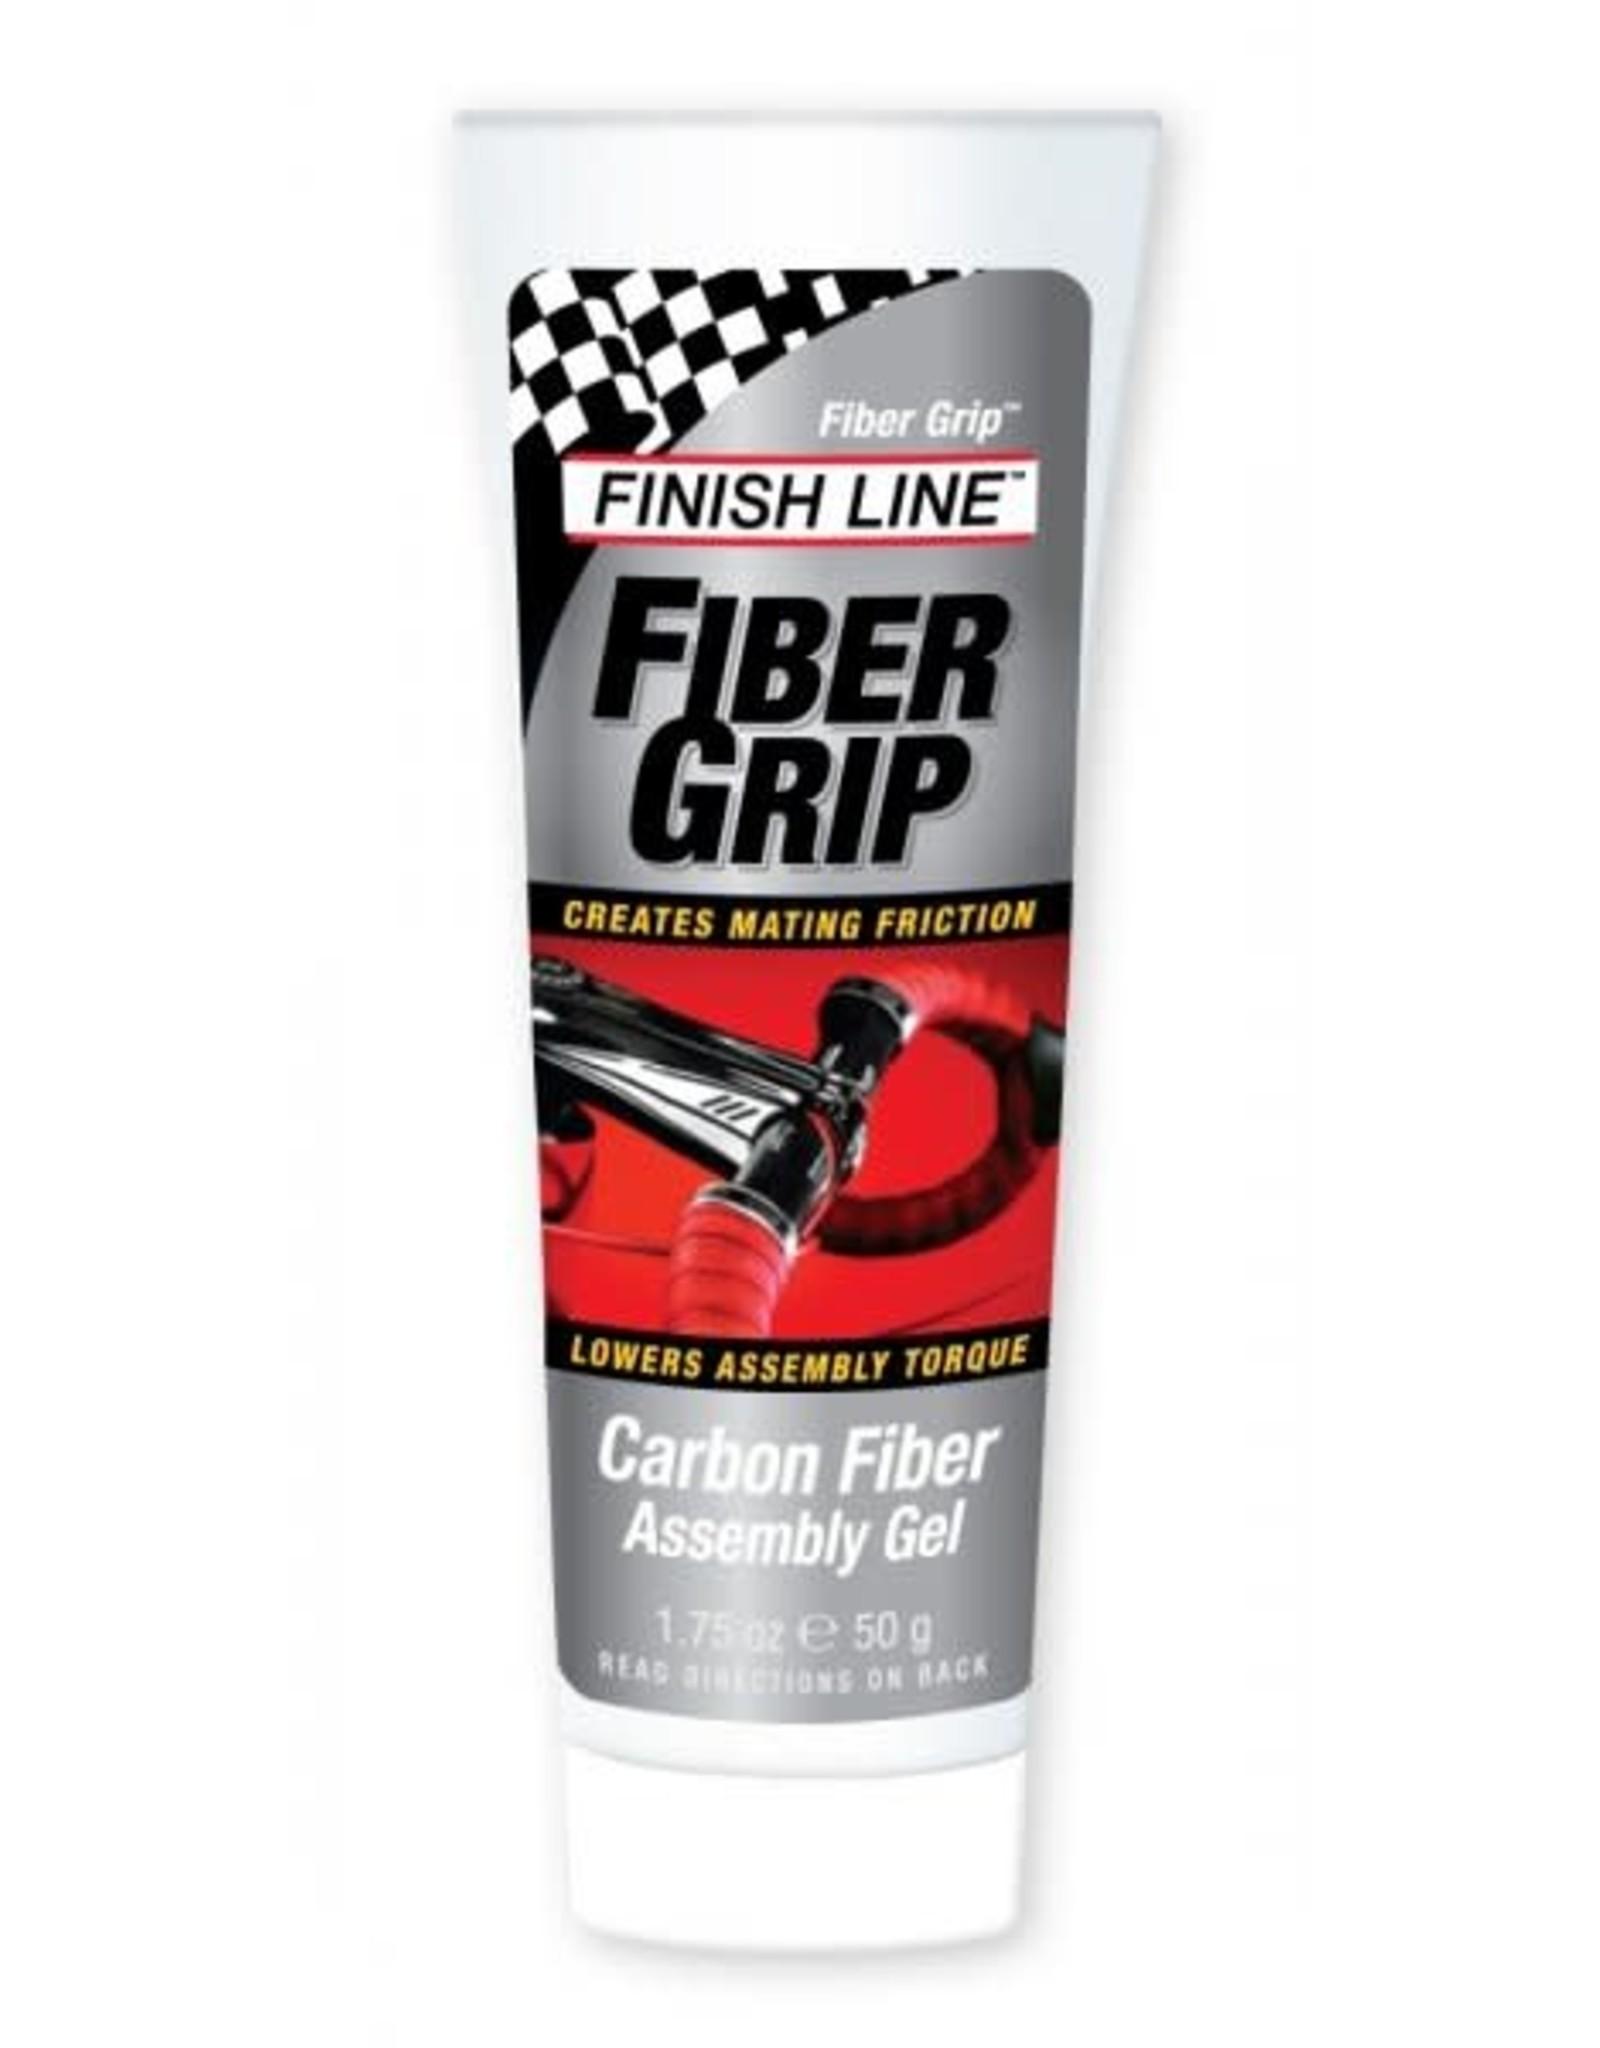 FINISH LINE FINISH LINE, FIBER GRIP 1.75OZ